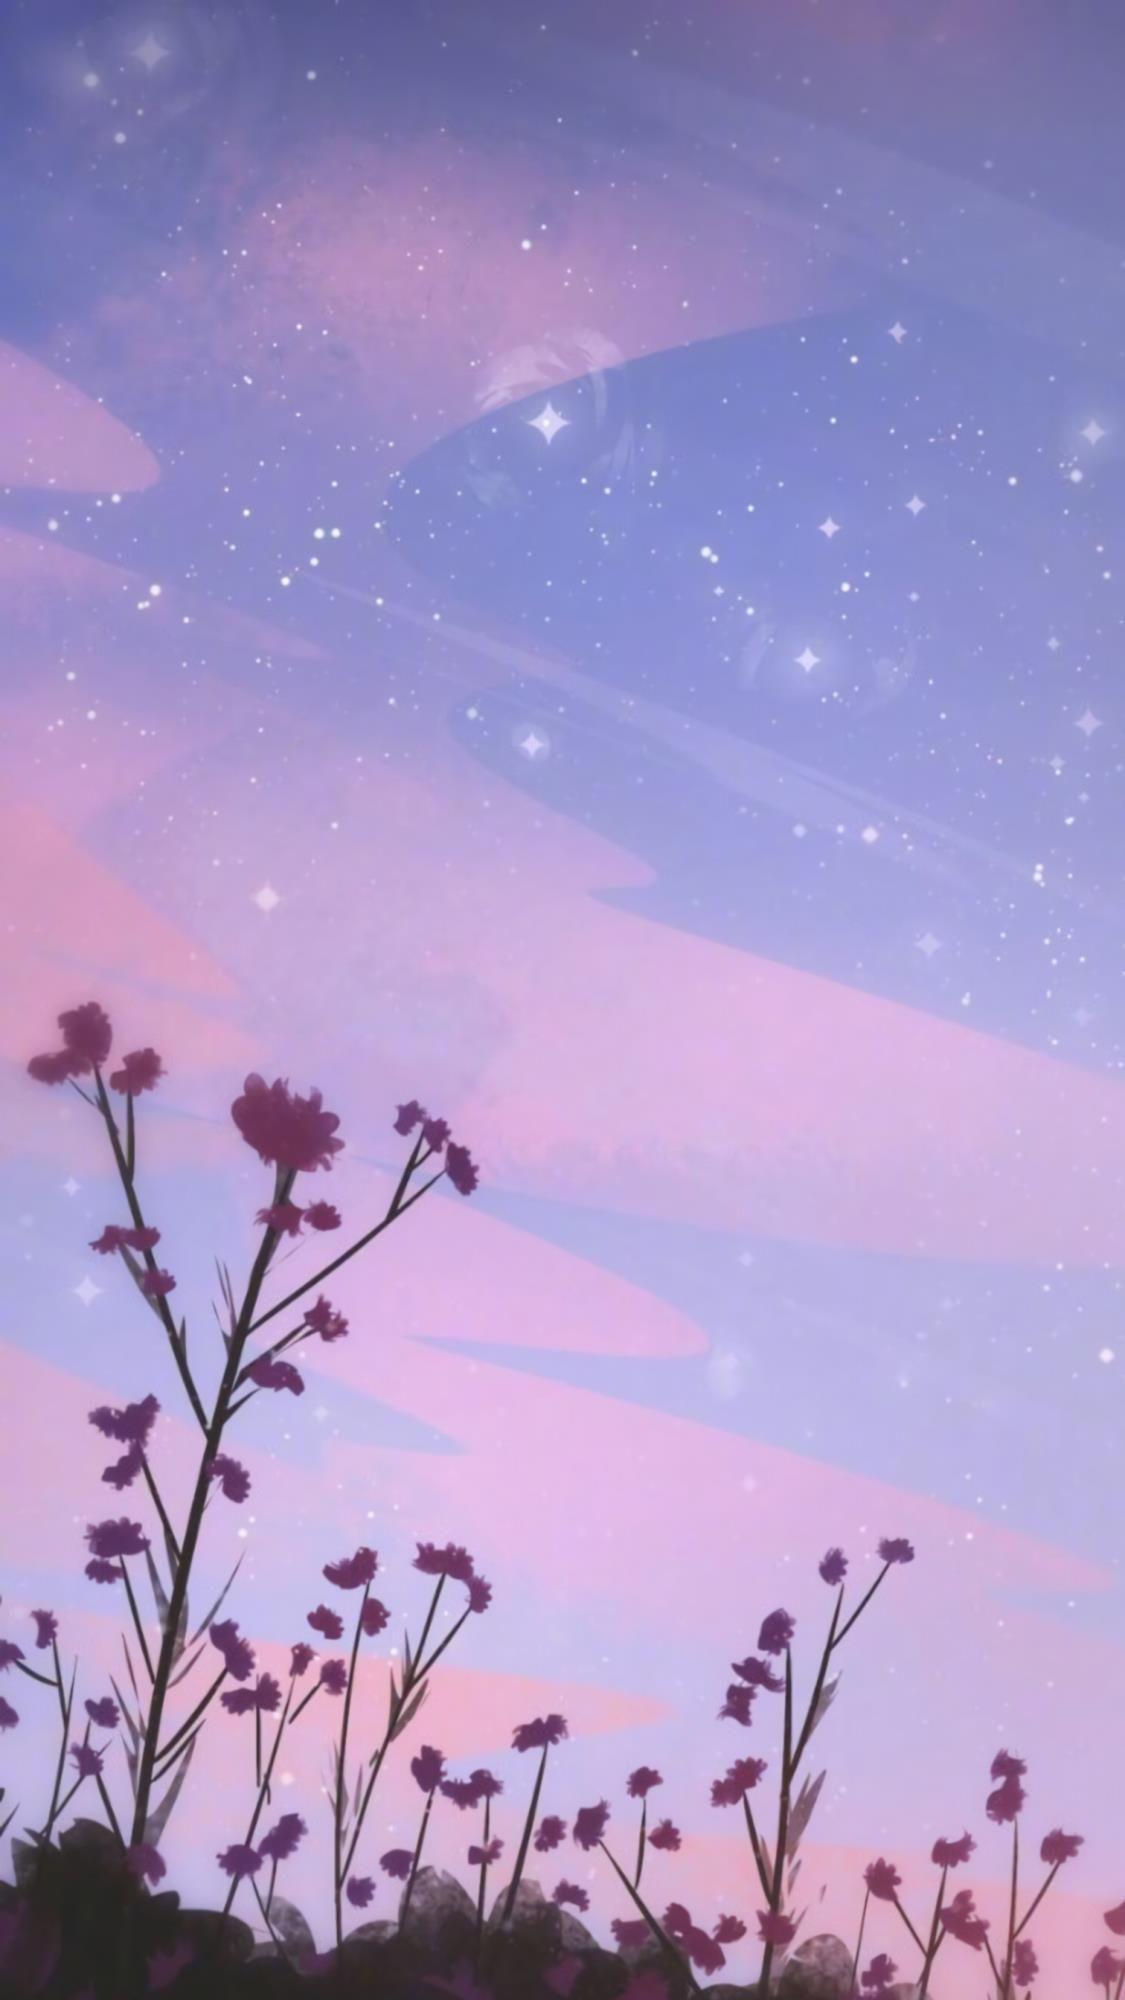 Summer Night Sky Wallpaper Anime Scenery Wallpaper Cute Wallpaper Backgrounds Nature Wallpaper